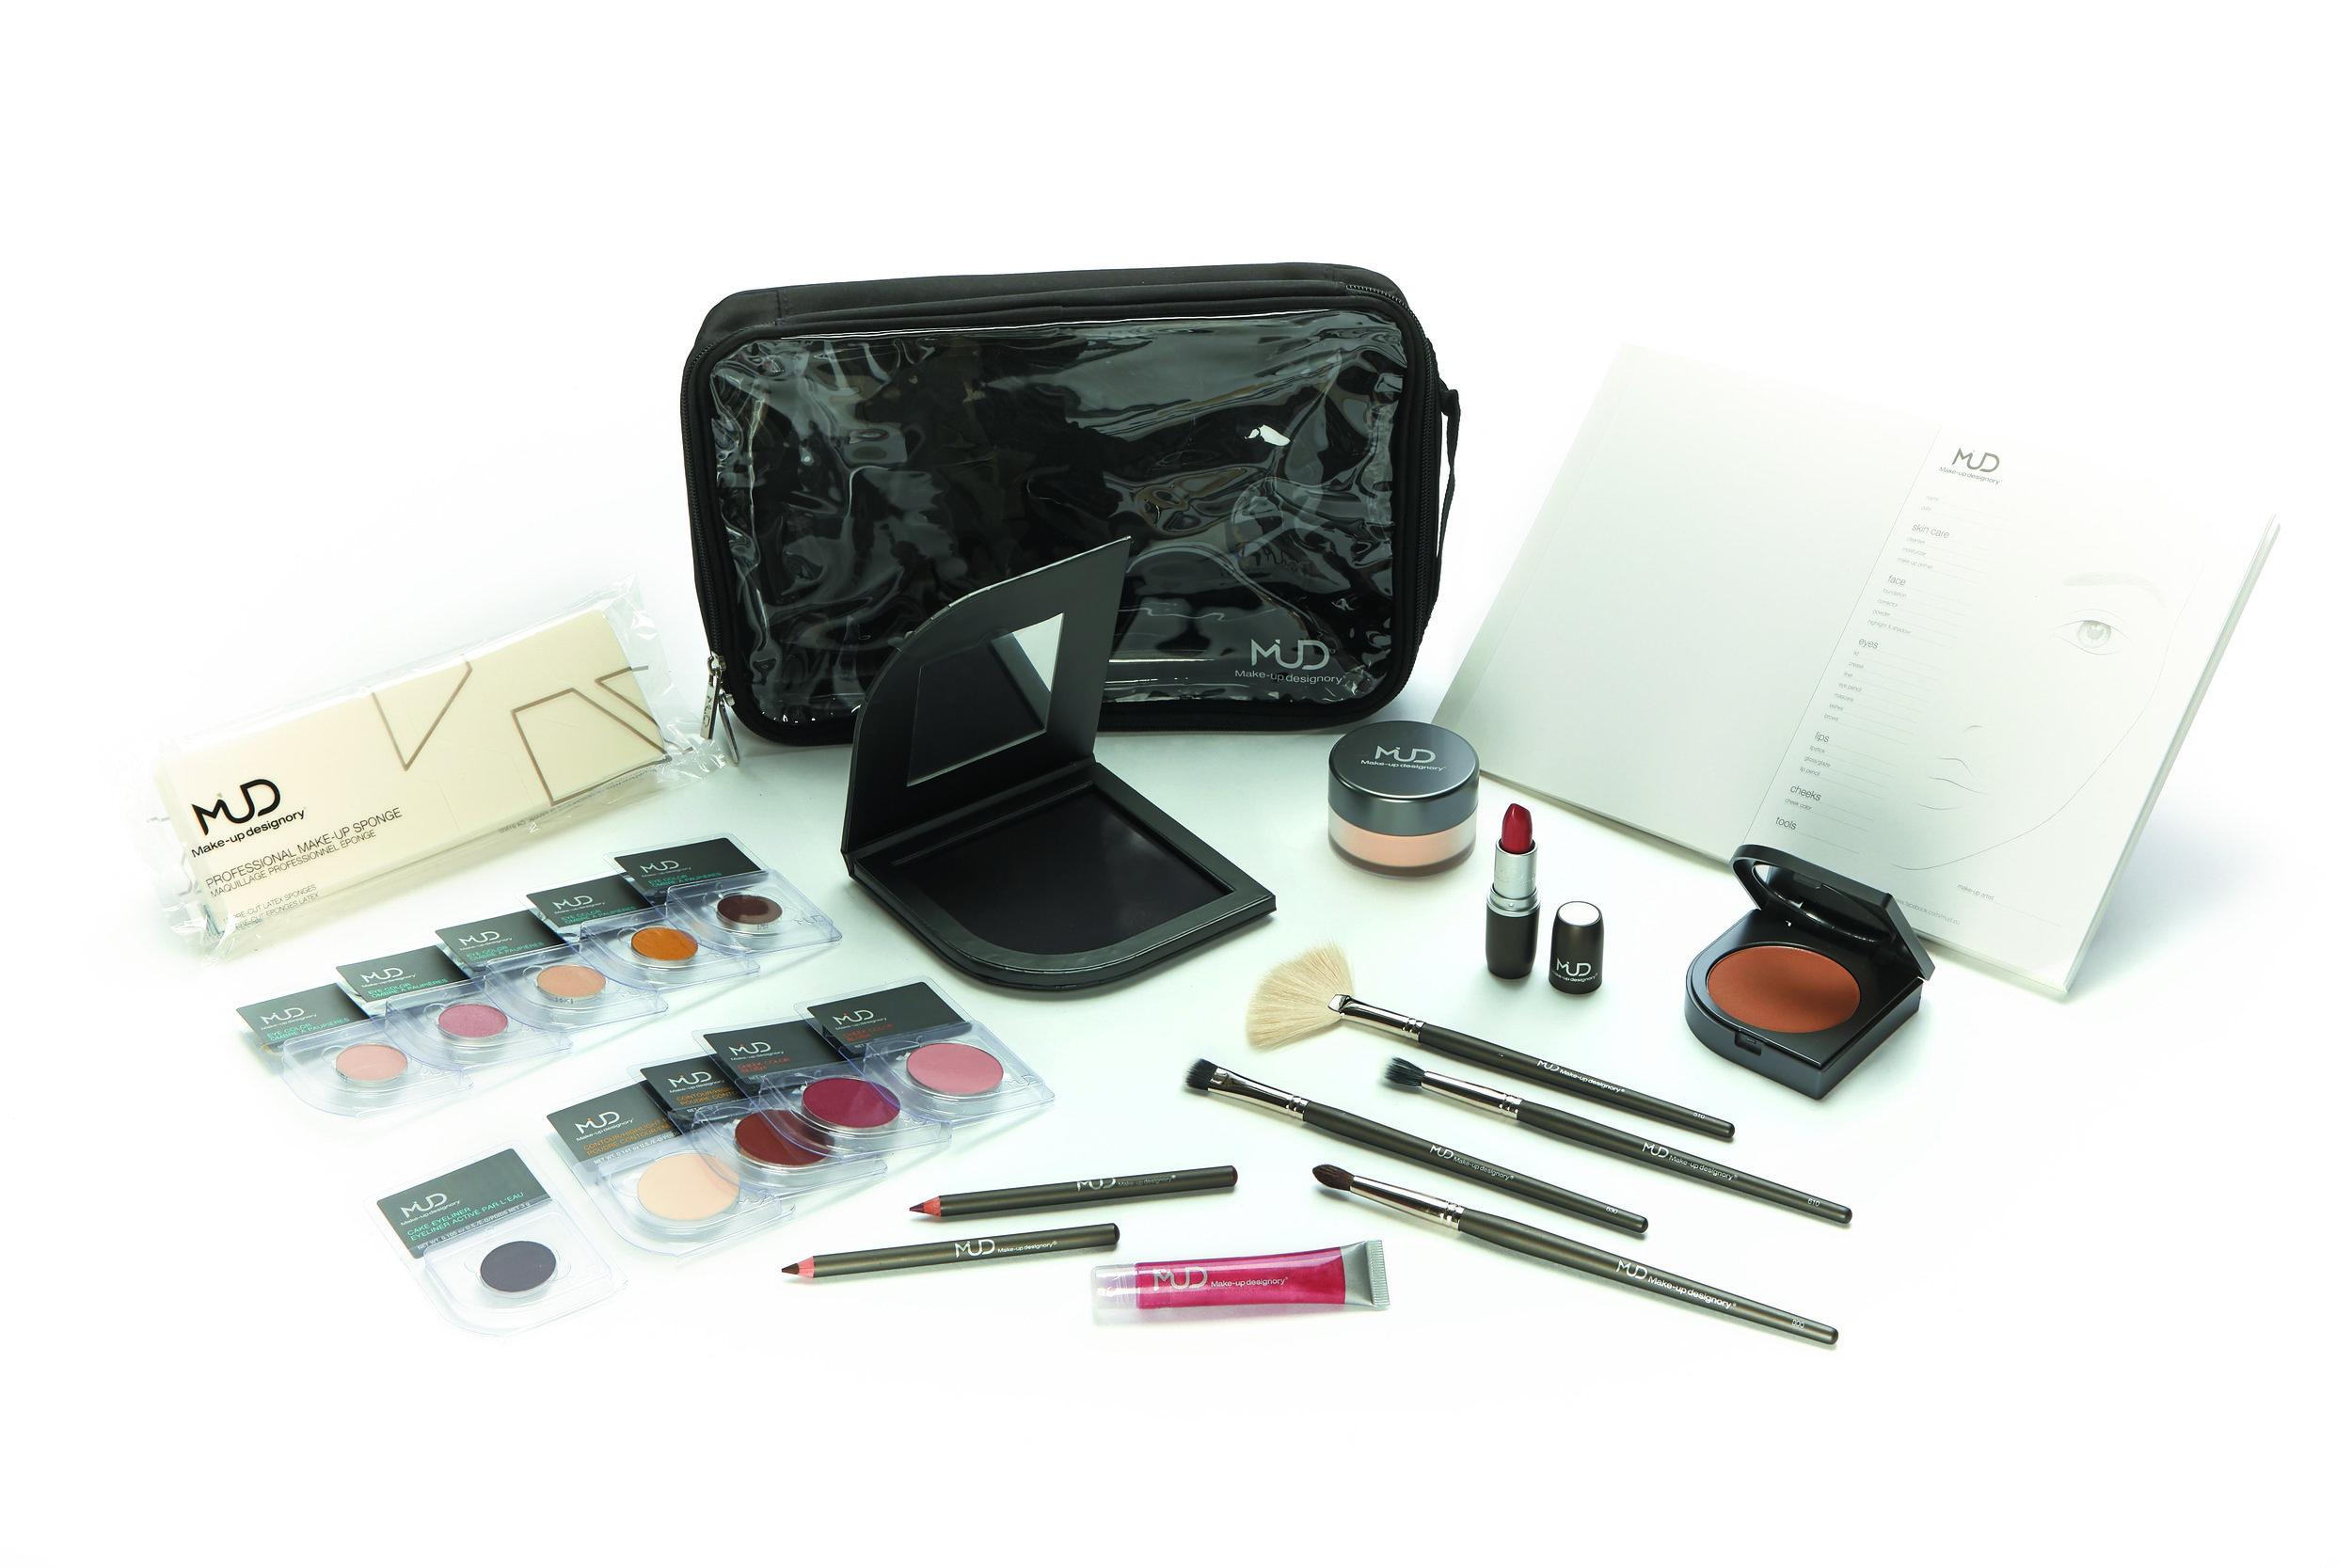 Kit 2 Professional Make-Up Artistry Program